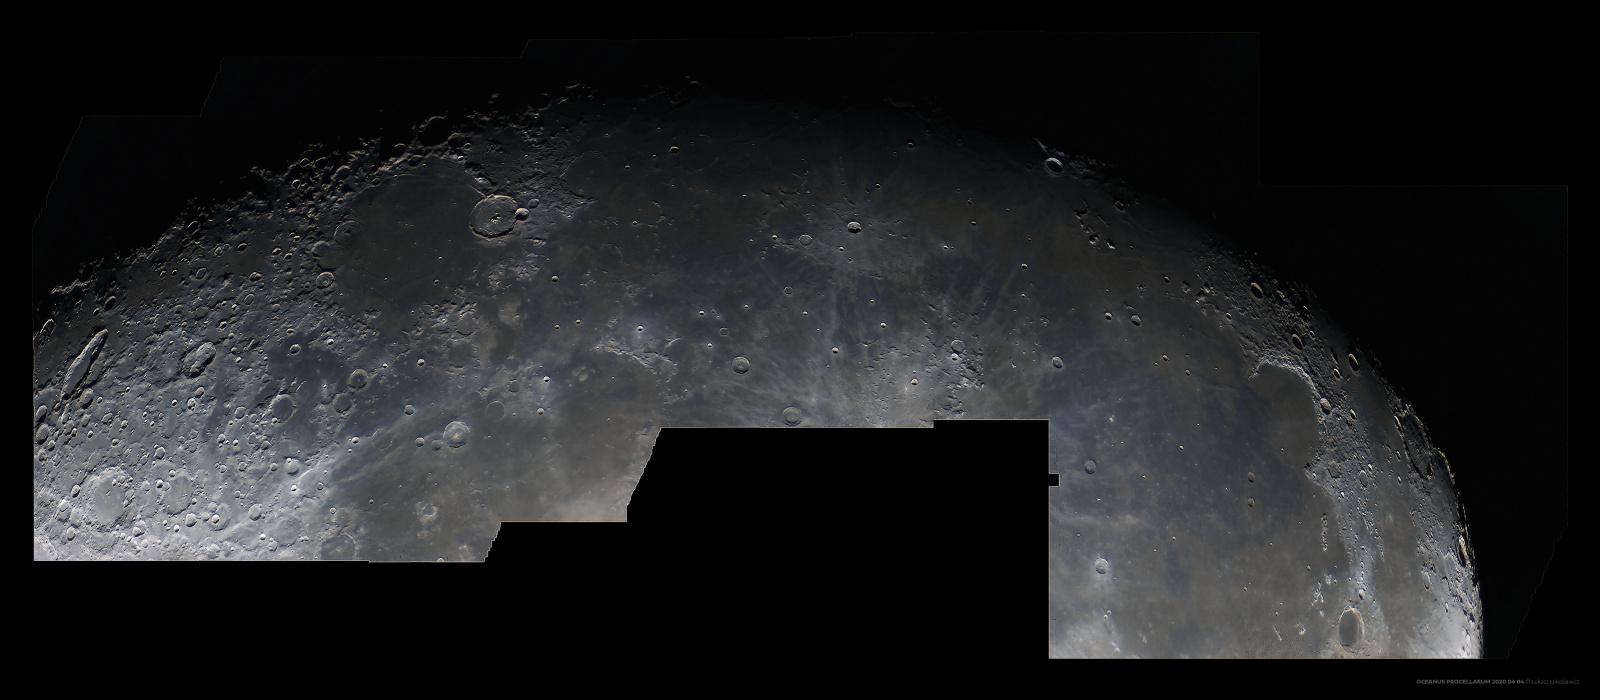 OCEANUS-PROCELLARUM-2020-04-04.thumb.jpg.4b69fe7868a93b8251620389c7494c77.jpg